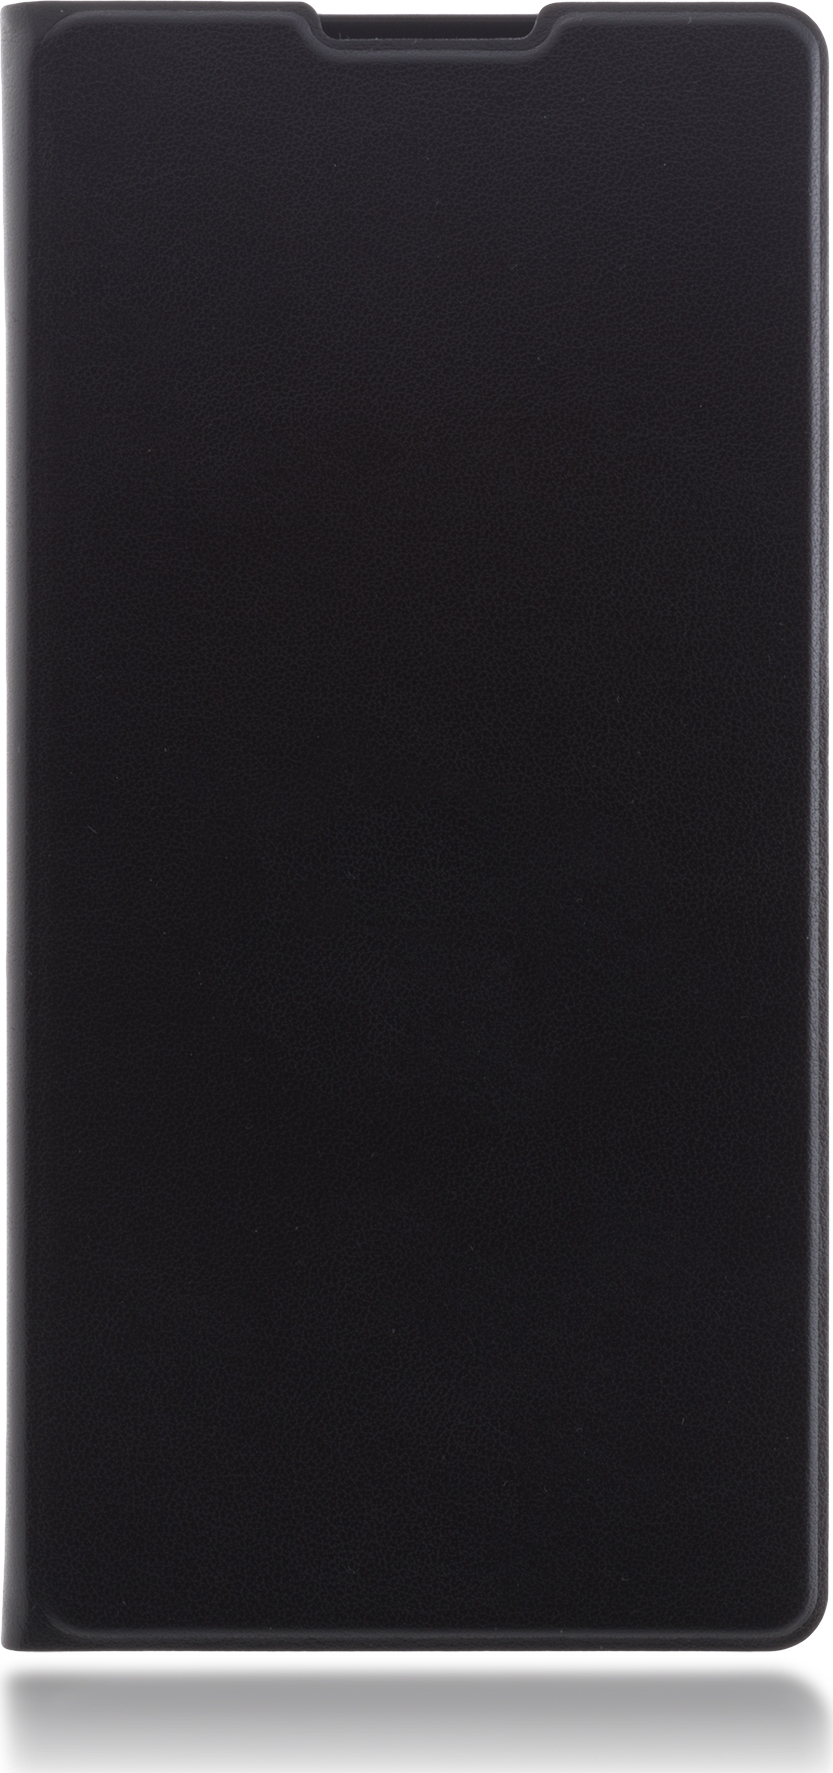 Чехол Brosco Book для Sony Xperia XA Ultra, черный